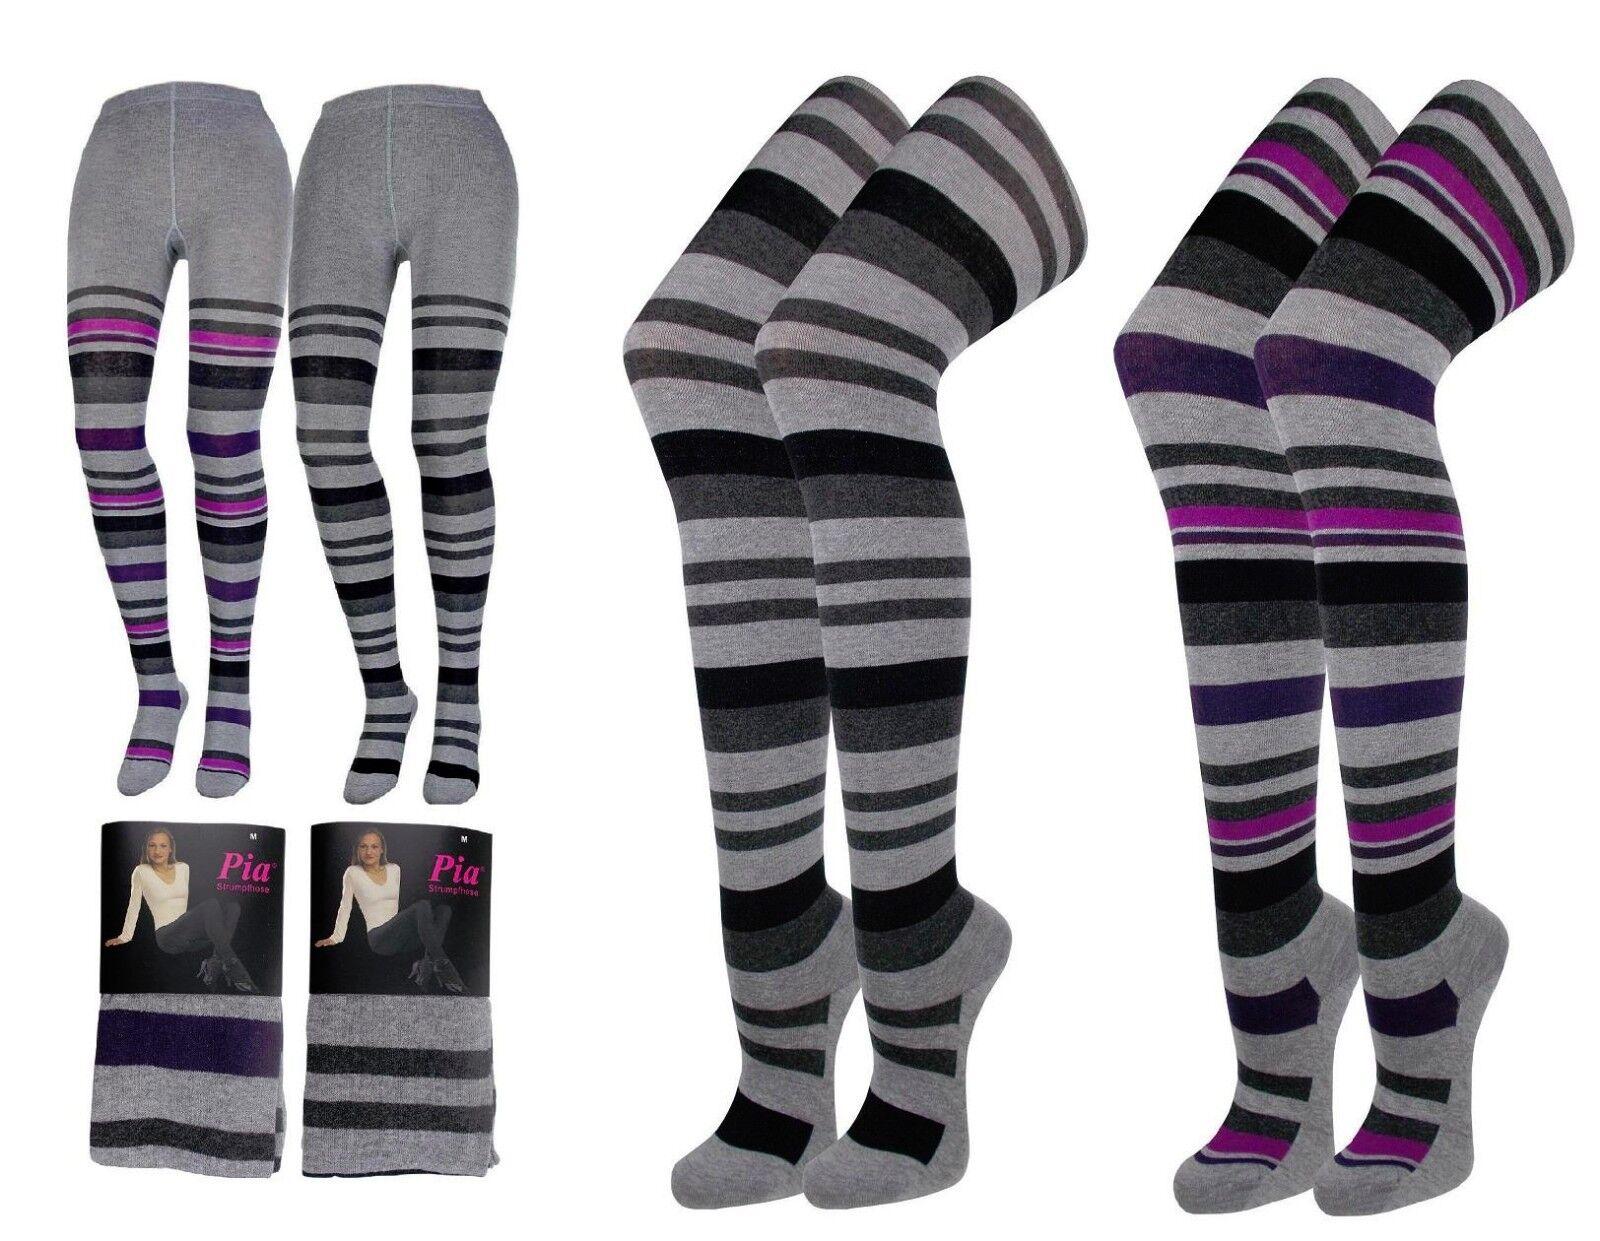 1, 2 oder 4 Stück Damen Strickstrumpfhosen Ringel Strumpfhose Baumwolle  1B4